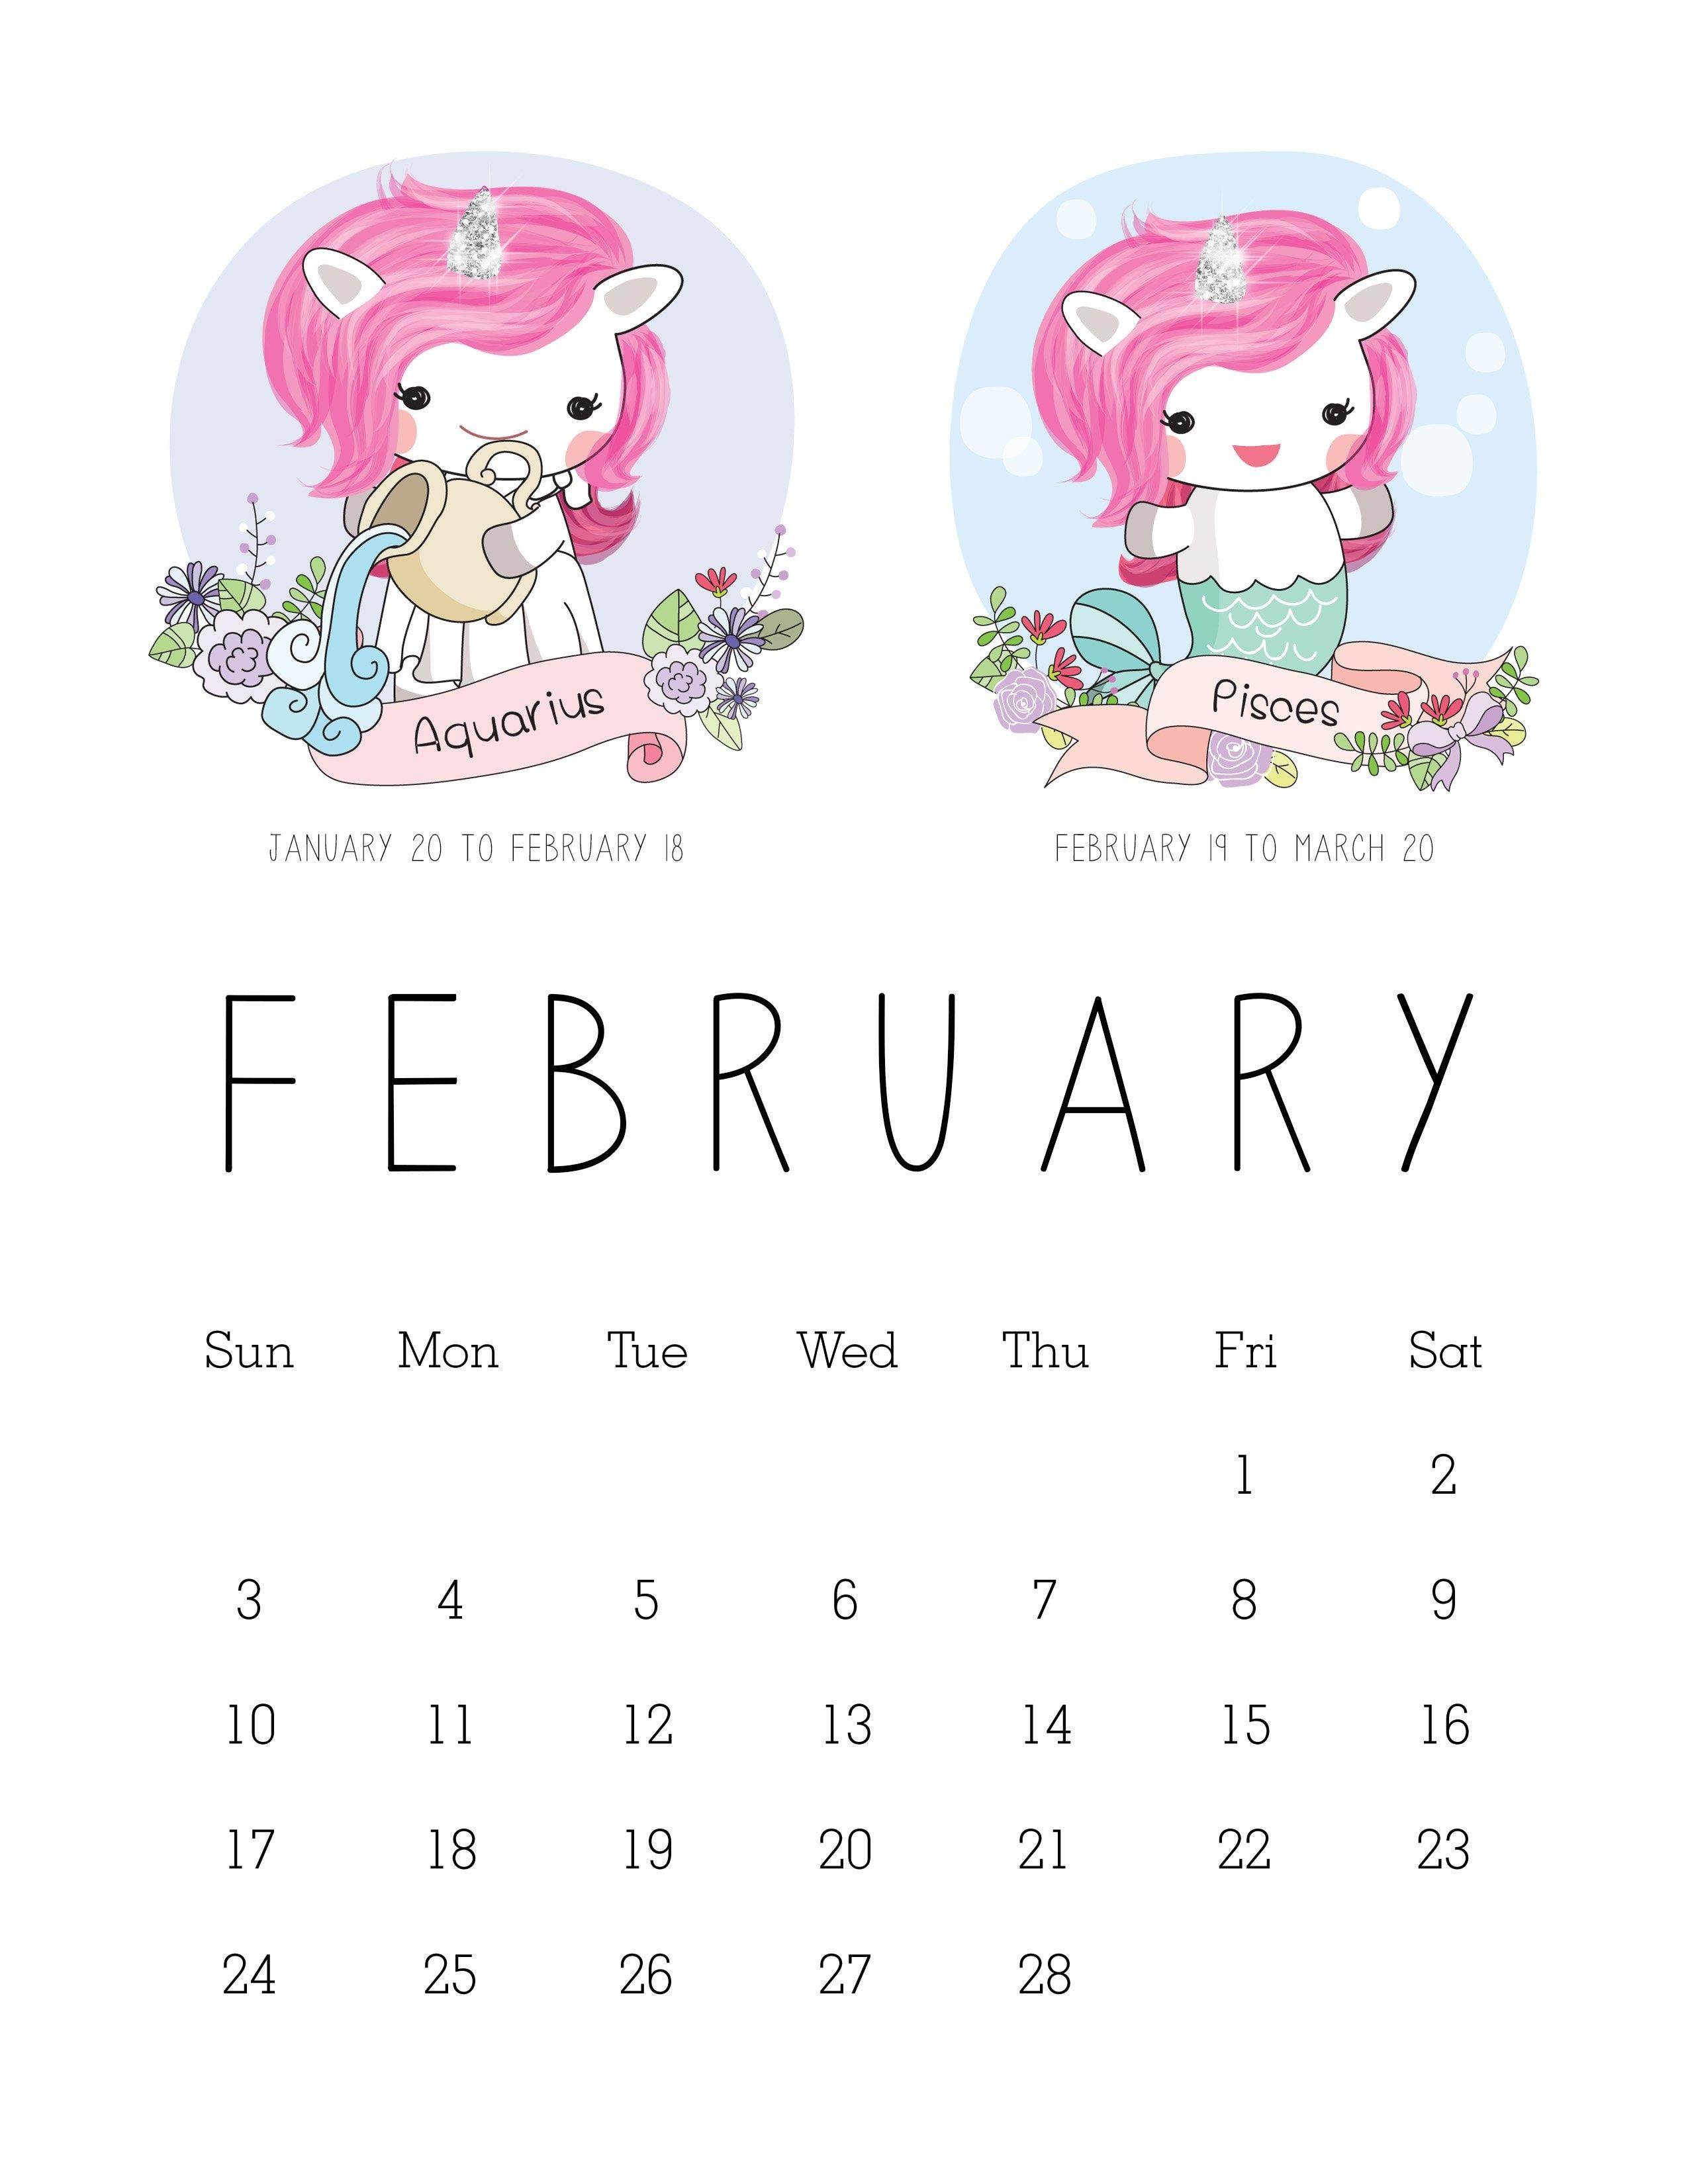 Free Printable 2019 Zodiac Sign Kawaii Unicorn Calendar – The Calendar 2019 Unicorn